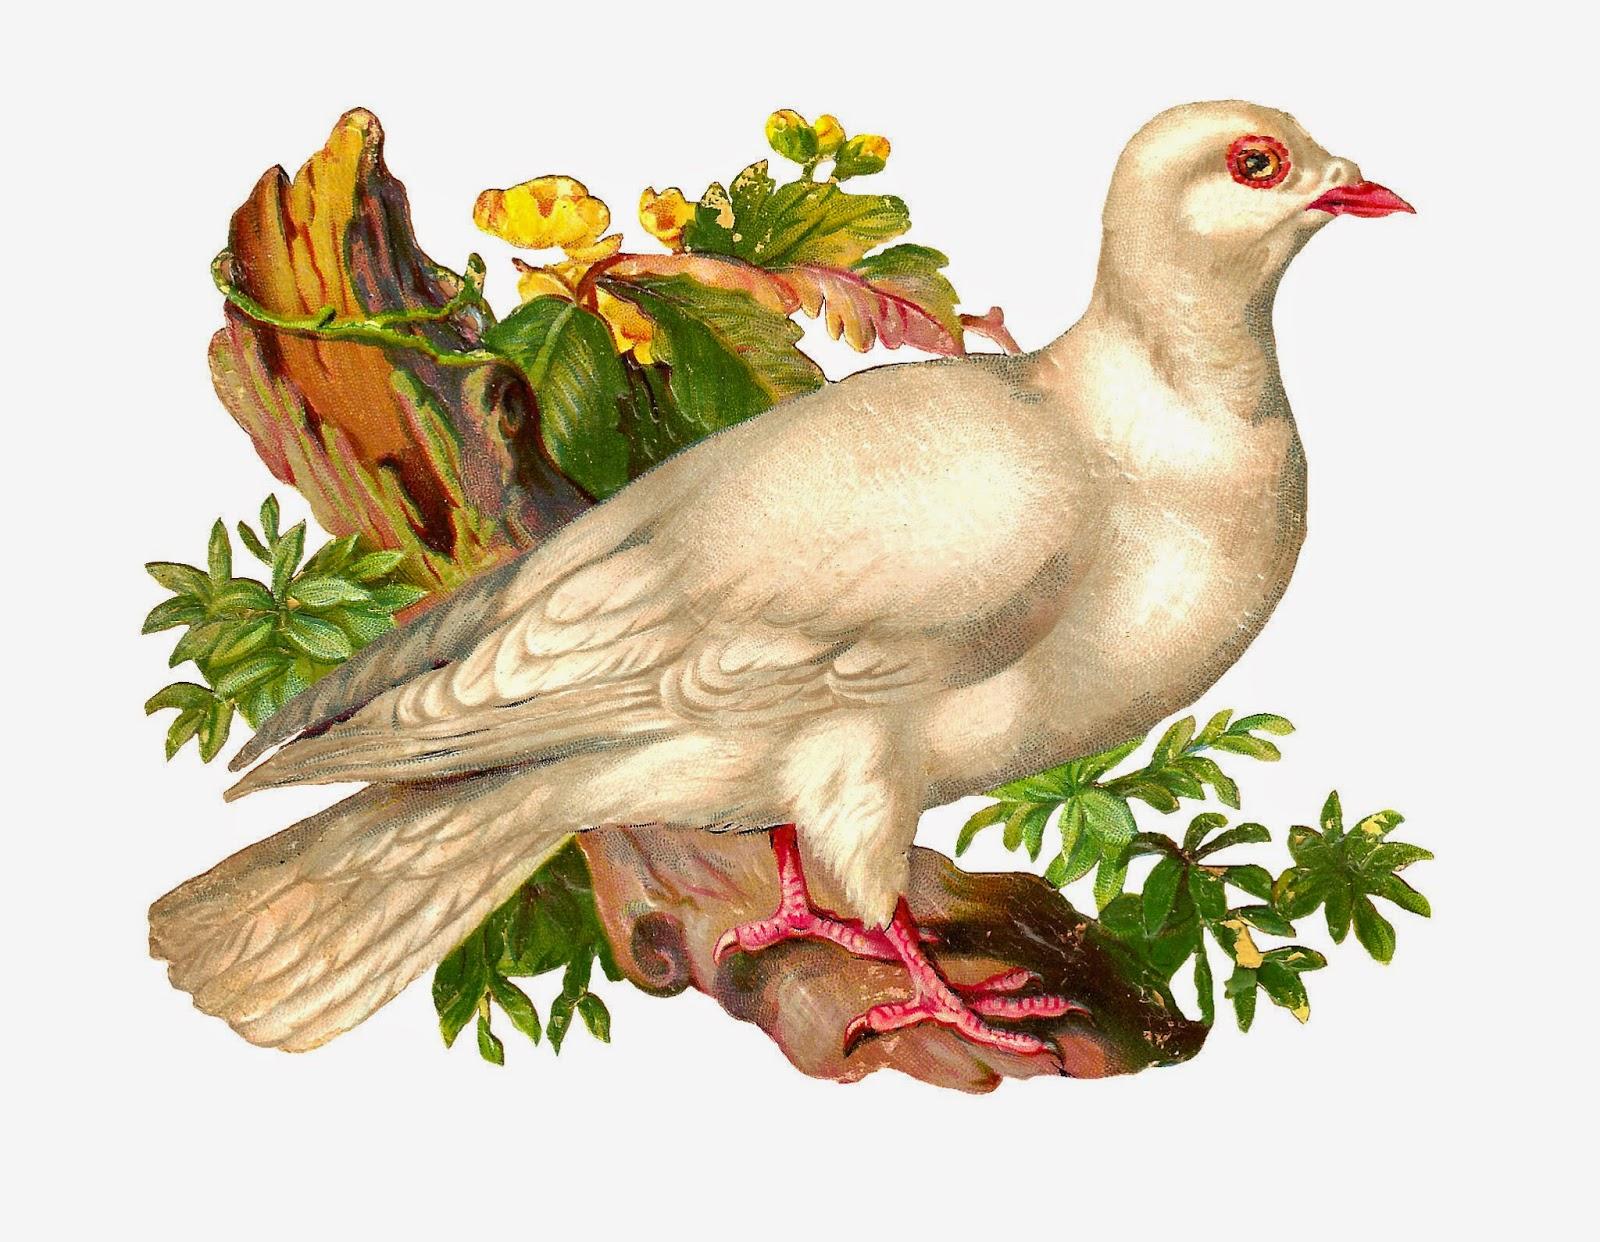 http://1.bp.blogspot.com/-4FWTmPI5Ppk/U5ULIlWRVpI/AAAAAAAAUTM/_ebqXfl5aWE/s1600/wht_pigeon_scrap.jpg